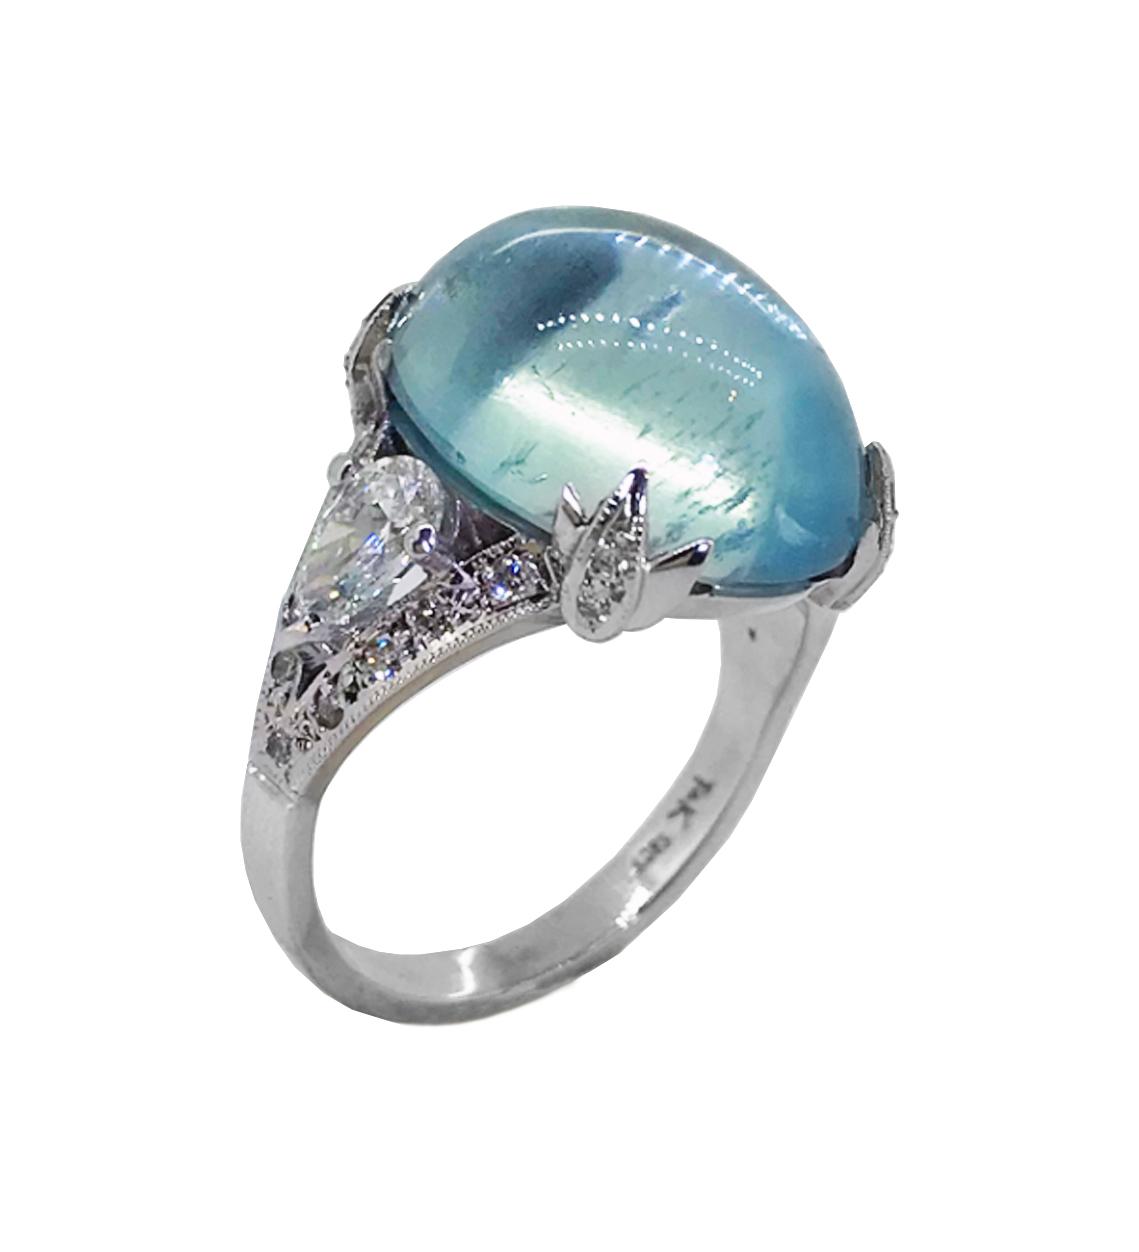 Bespoke Cabochon Aquamarine & Pear-shaped Diamond Ring